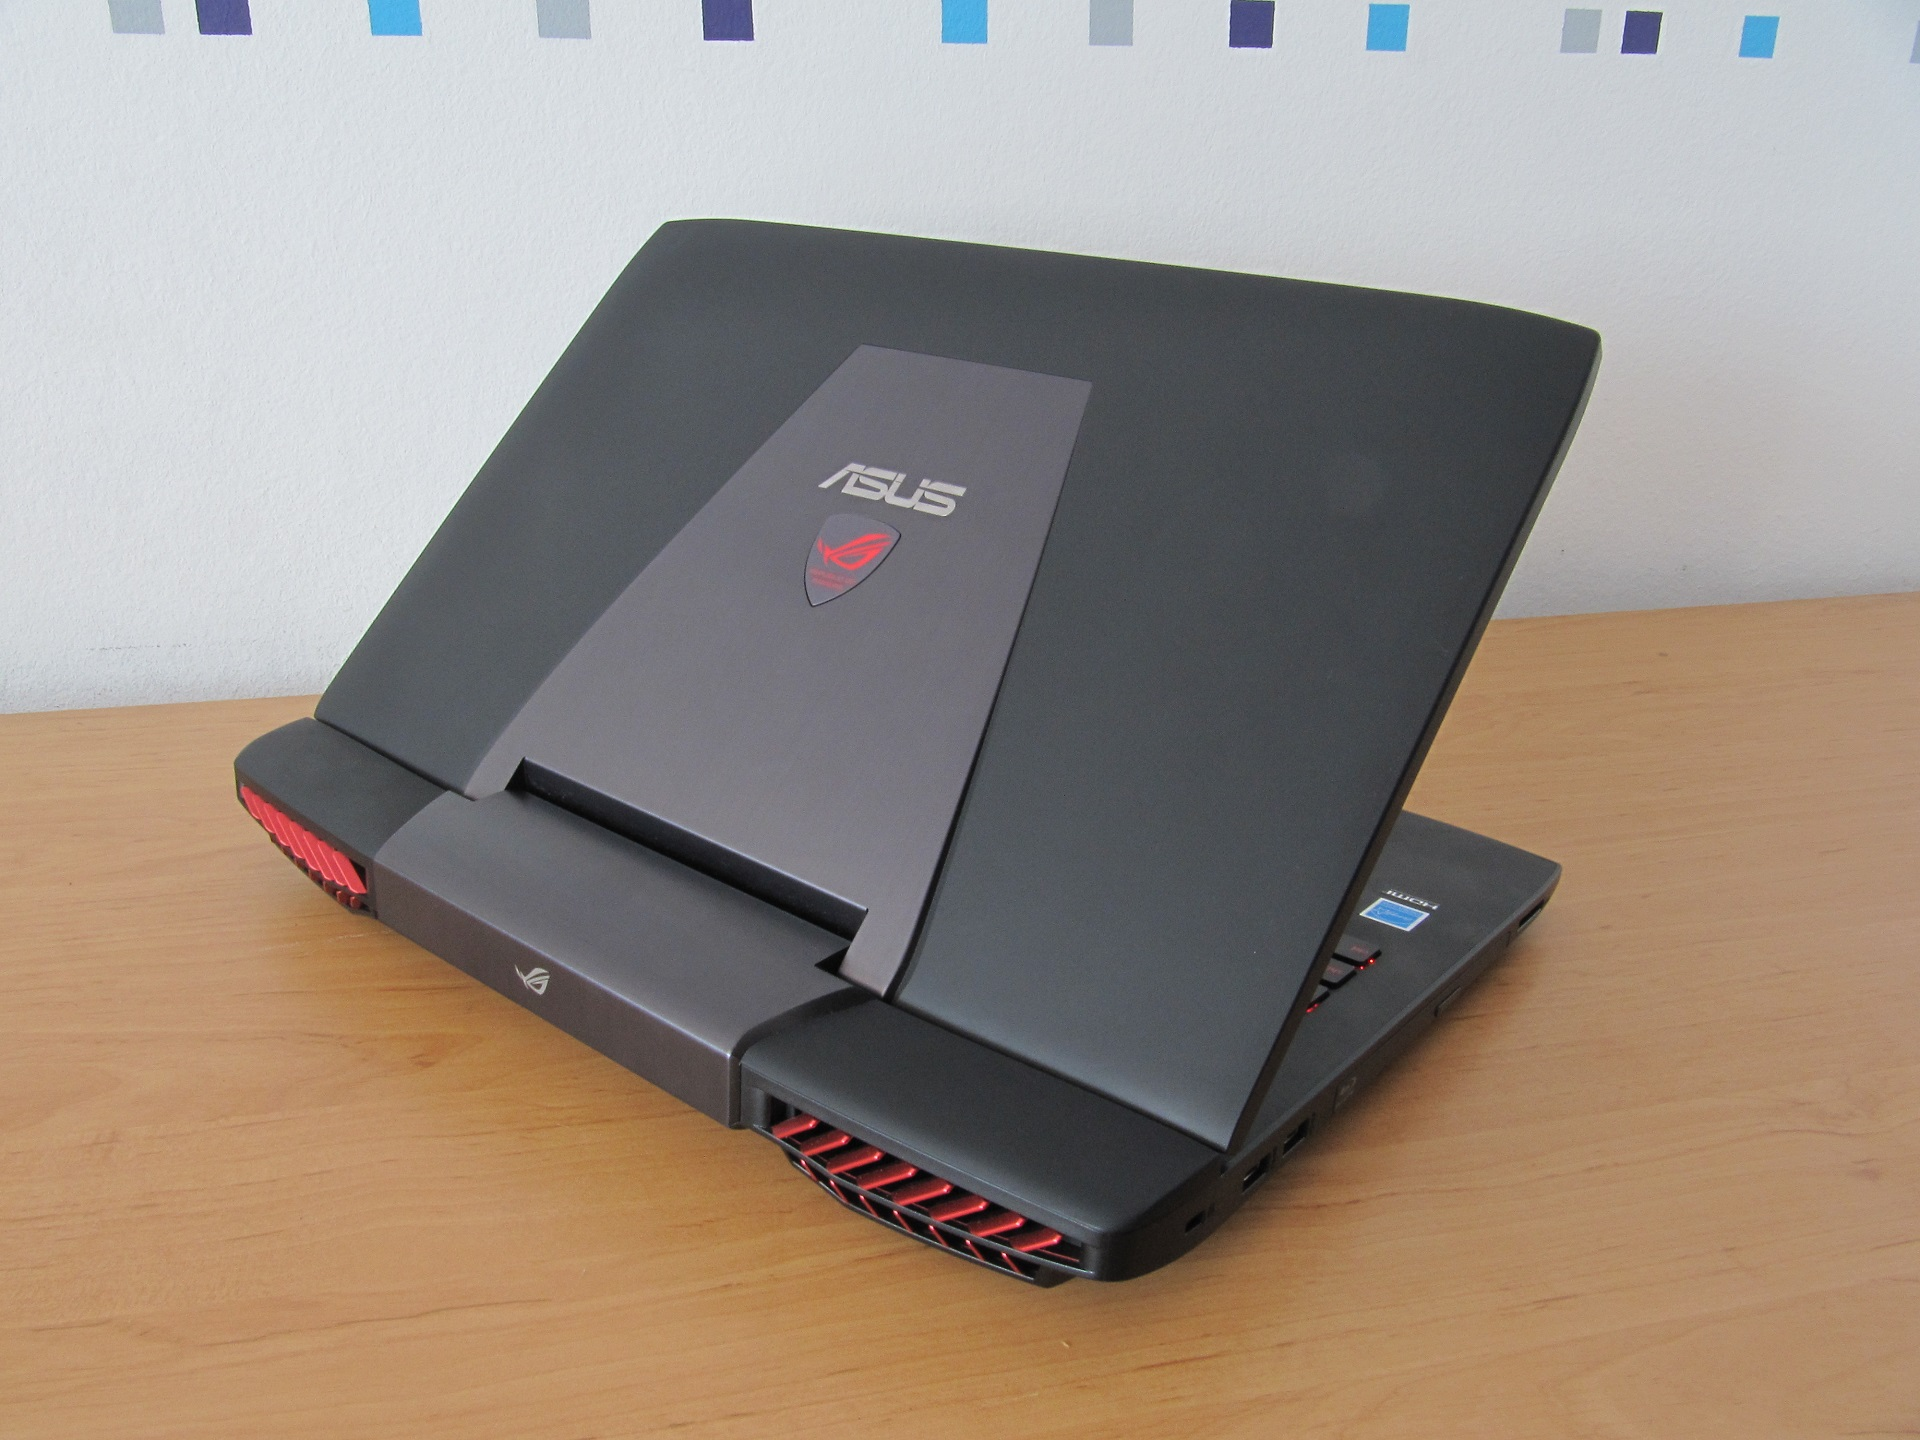 Asus ROG G751JY – prenosivo računalo